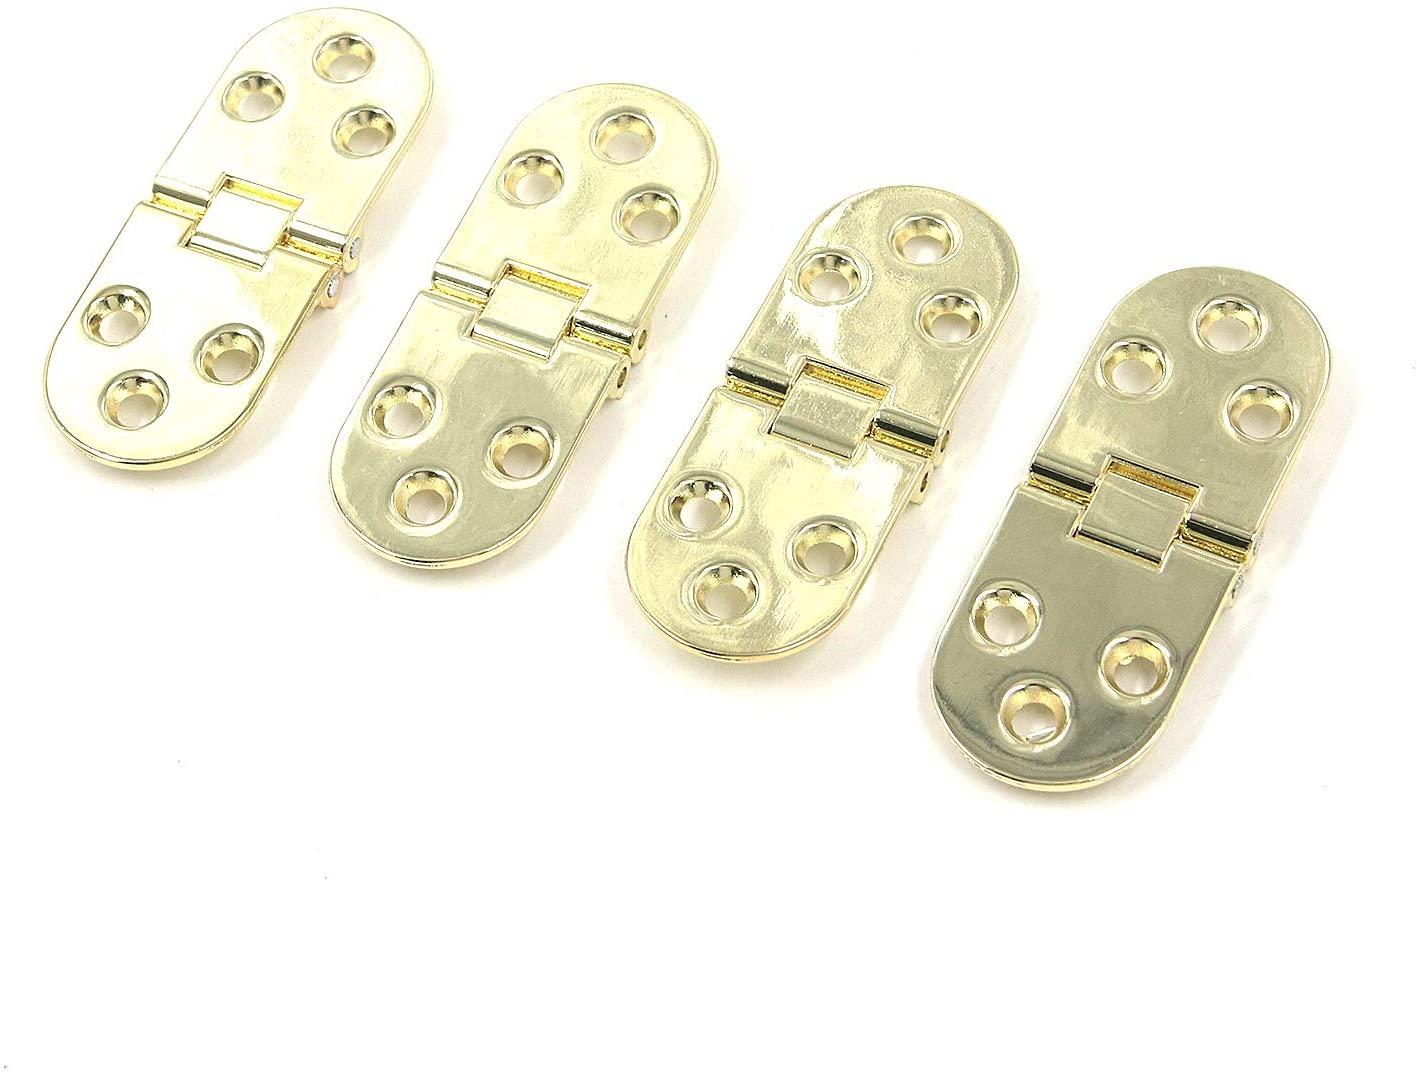 Tulead Golden Hinges Drawer Hinges 90° Hinge Folding Table Hinges 180° Coffee Table Hinges Metal Tray Hinge 4PCS with Screws